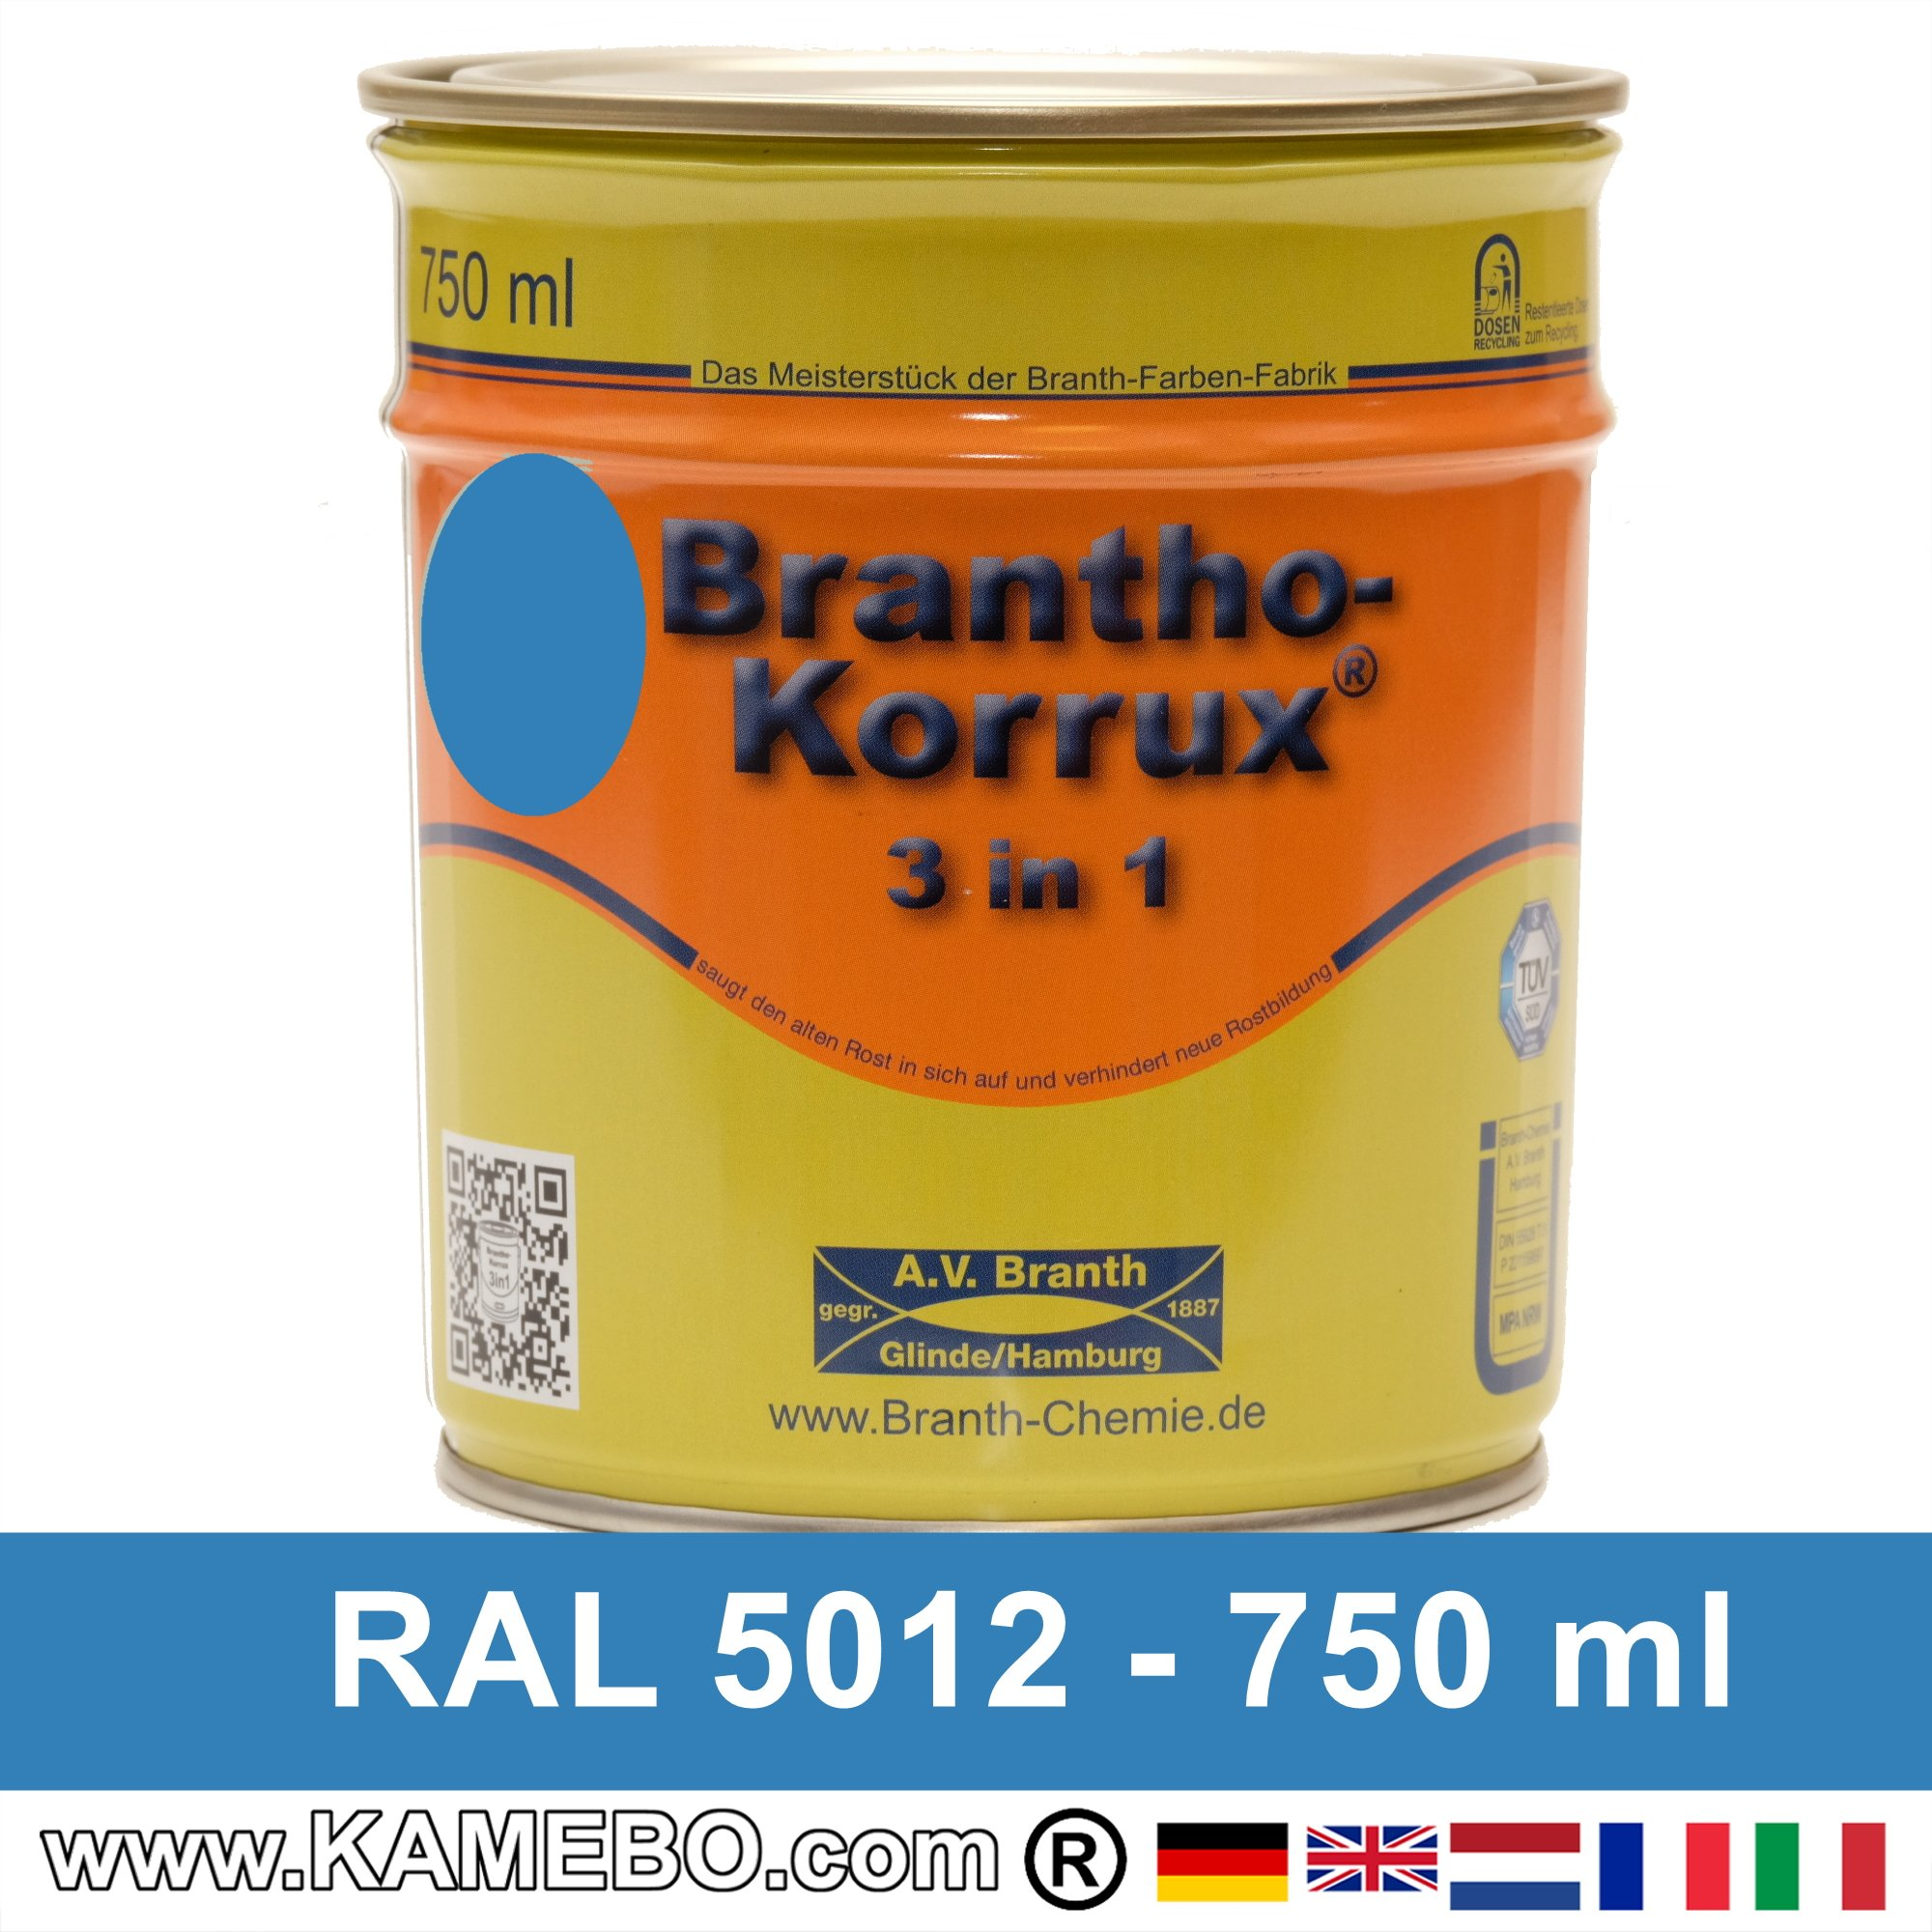 brantho korrux 3in1 rostschutzlack ral 5012 lichtblau 750 ml. Black Bedroom Furniture Sets. Home Design Ideas